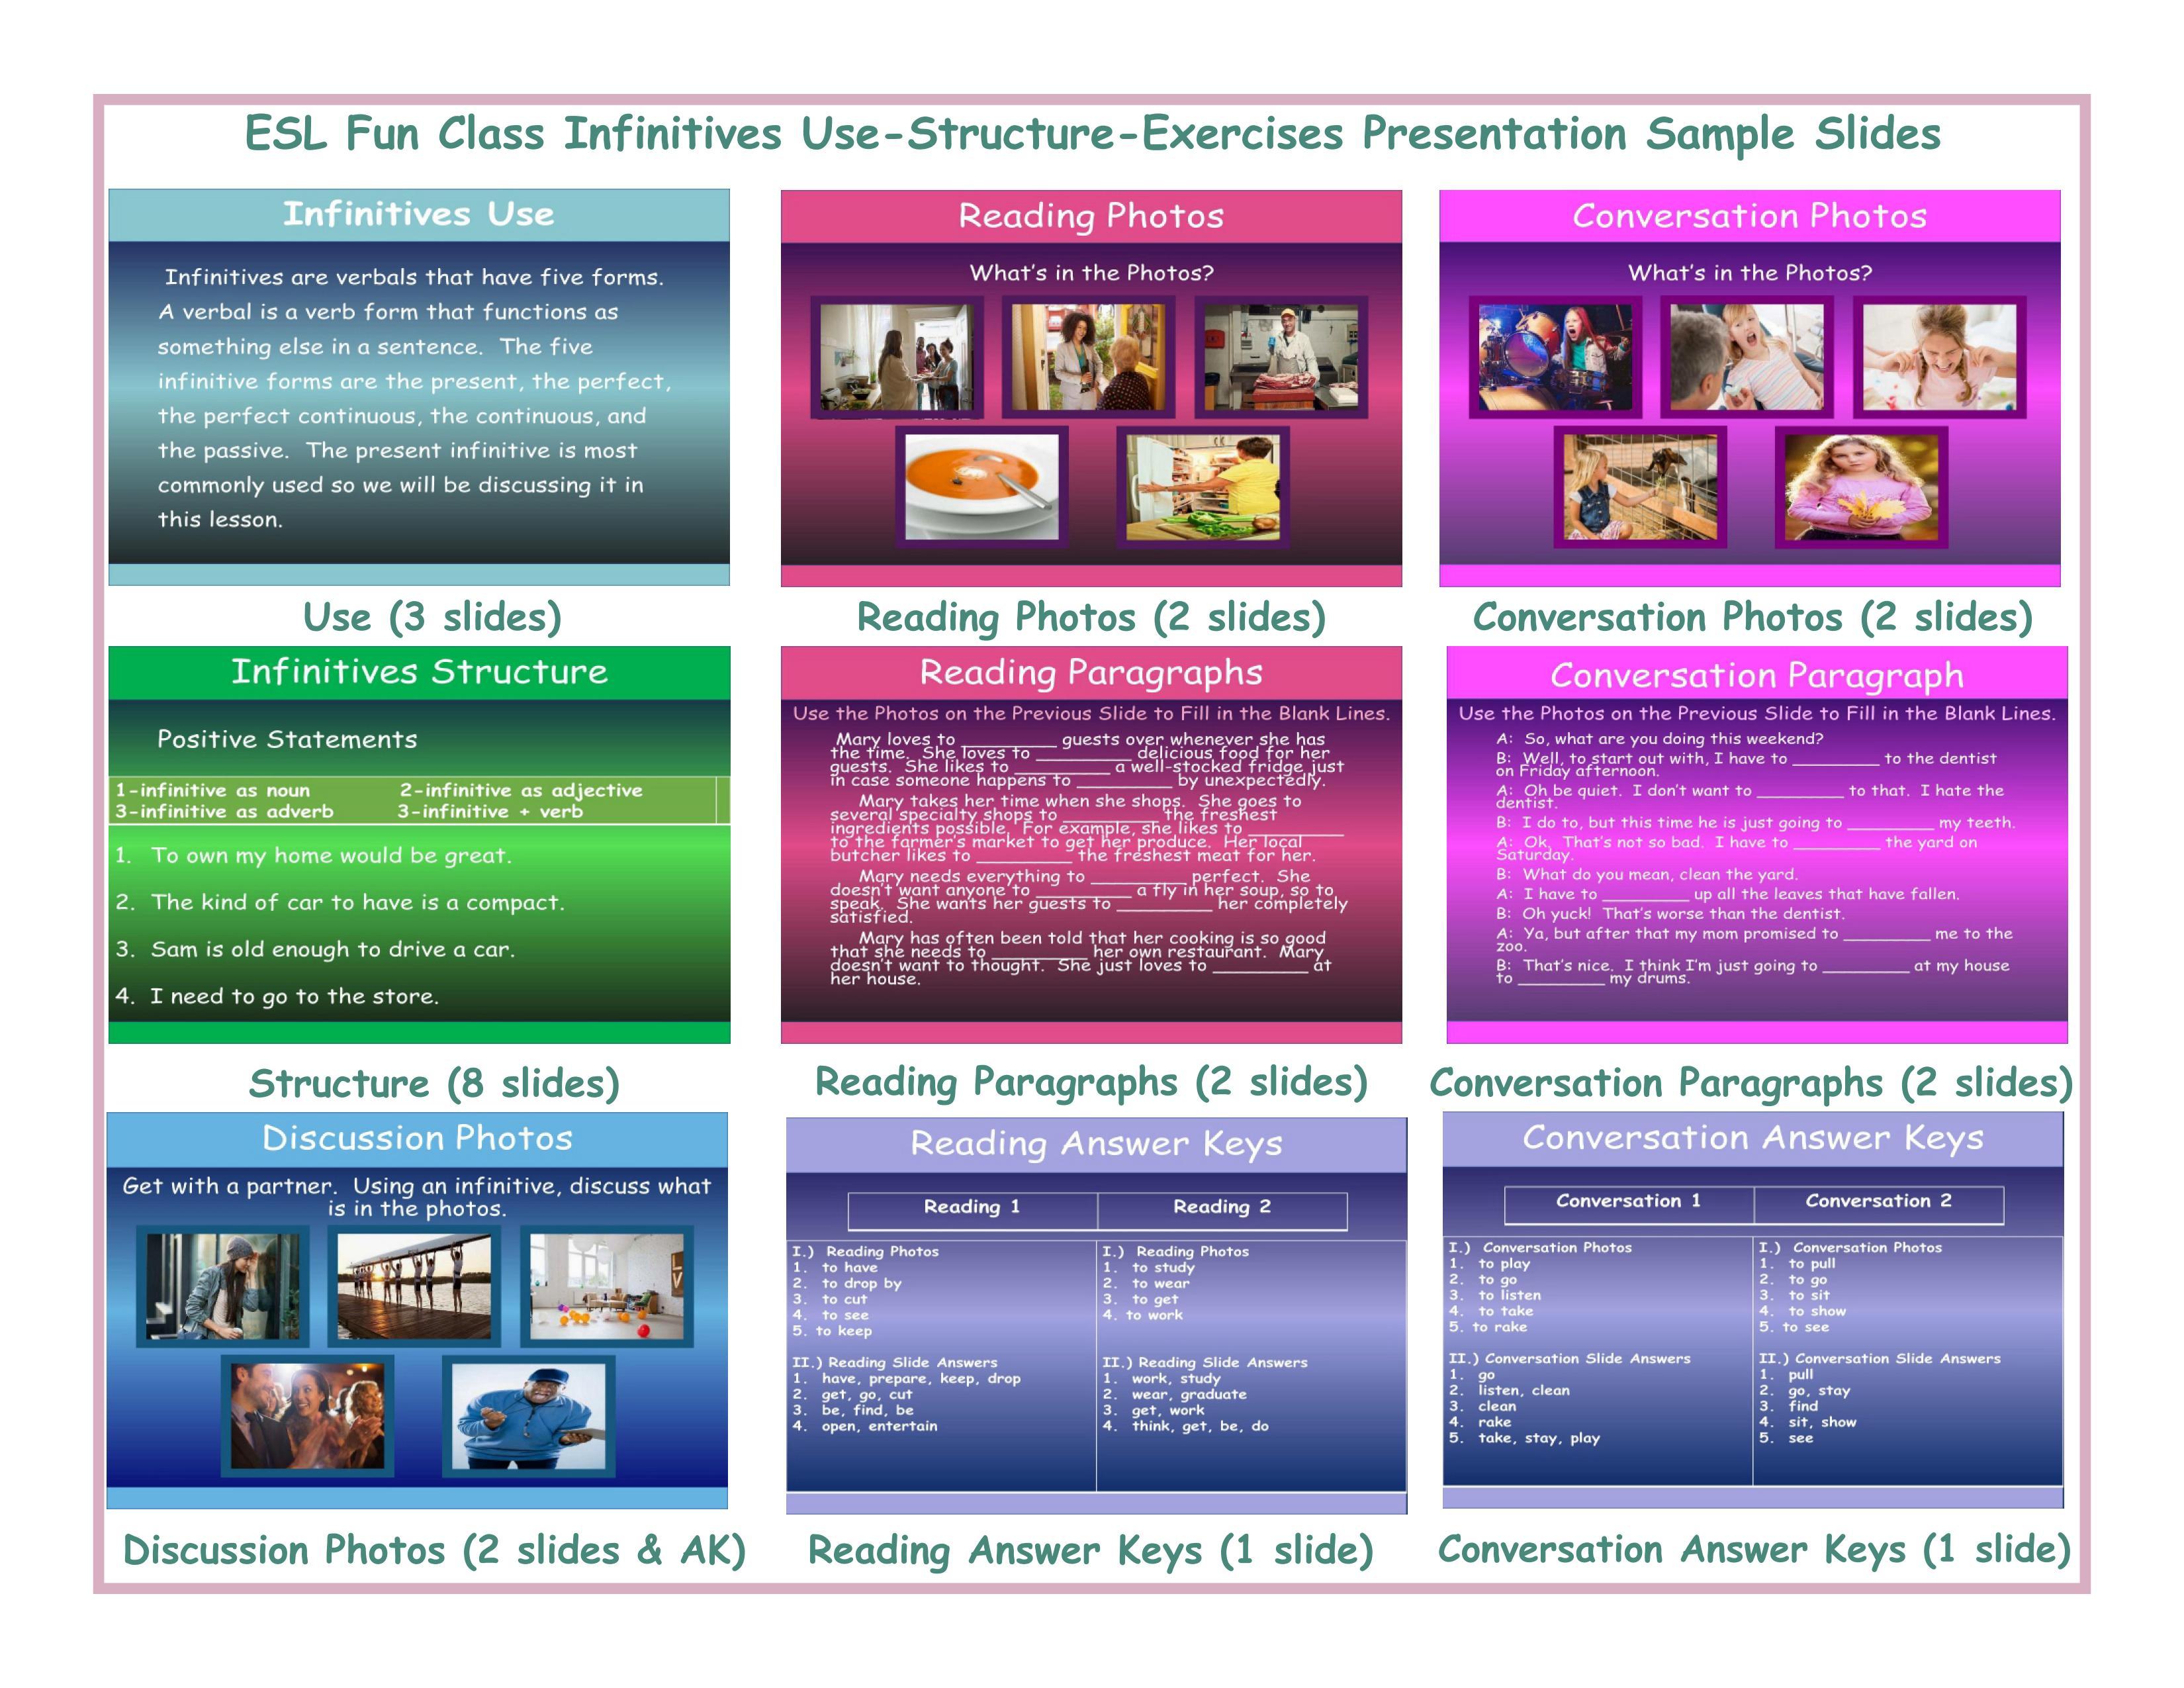 Infinitives Structure, Read, Conversation, & Discuss Presentation